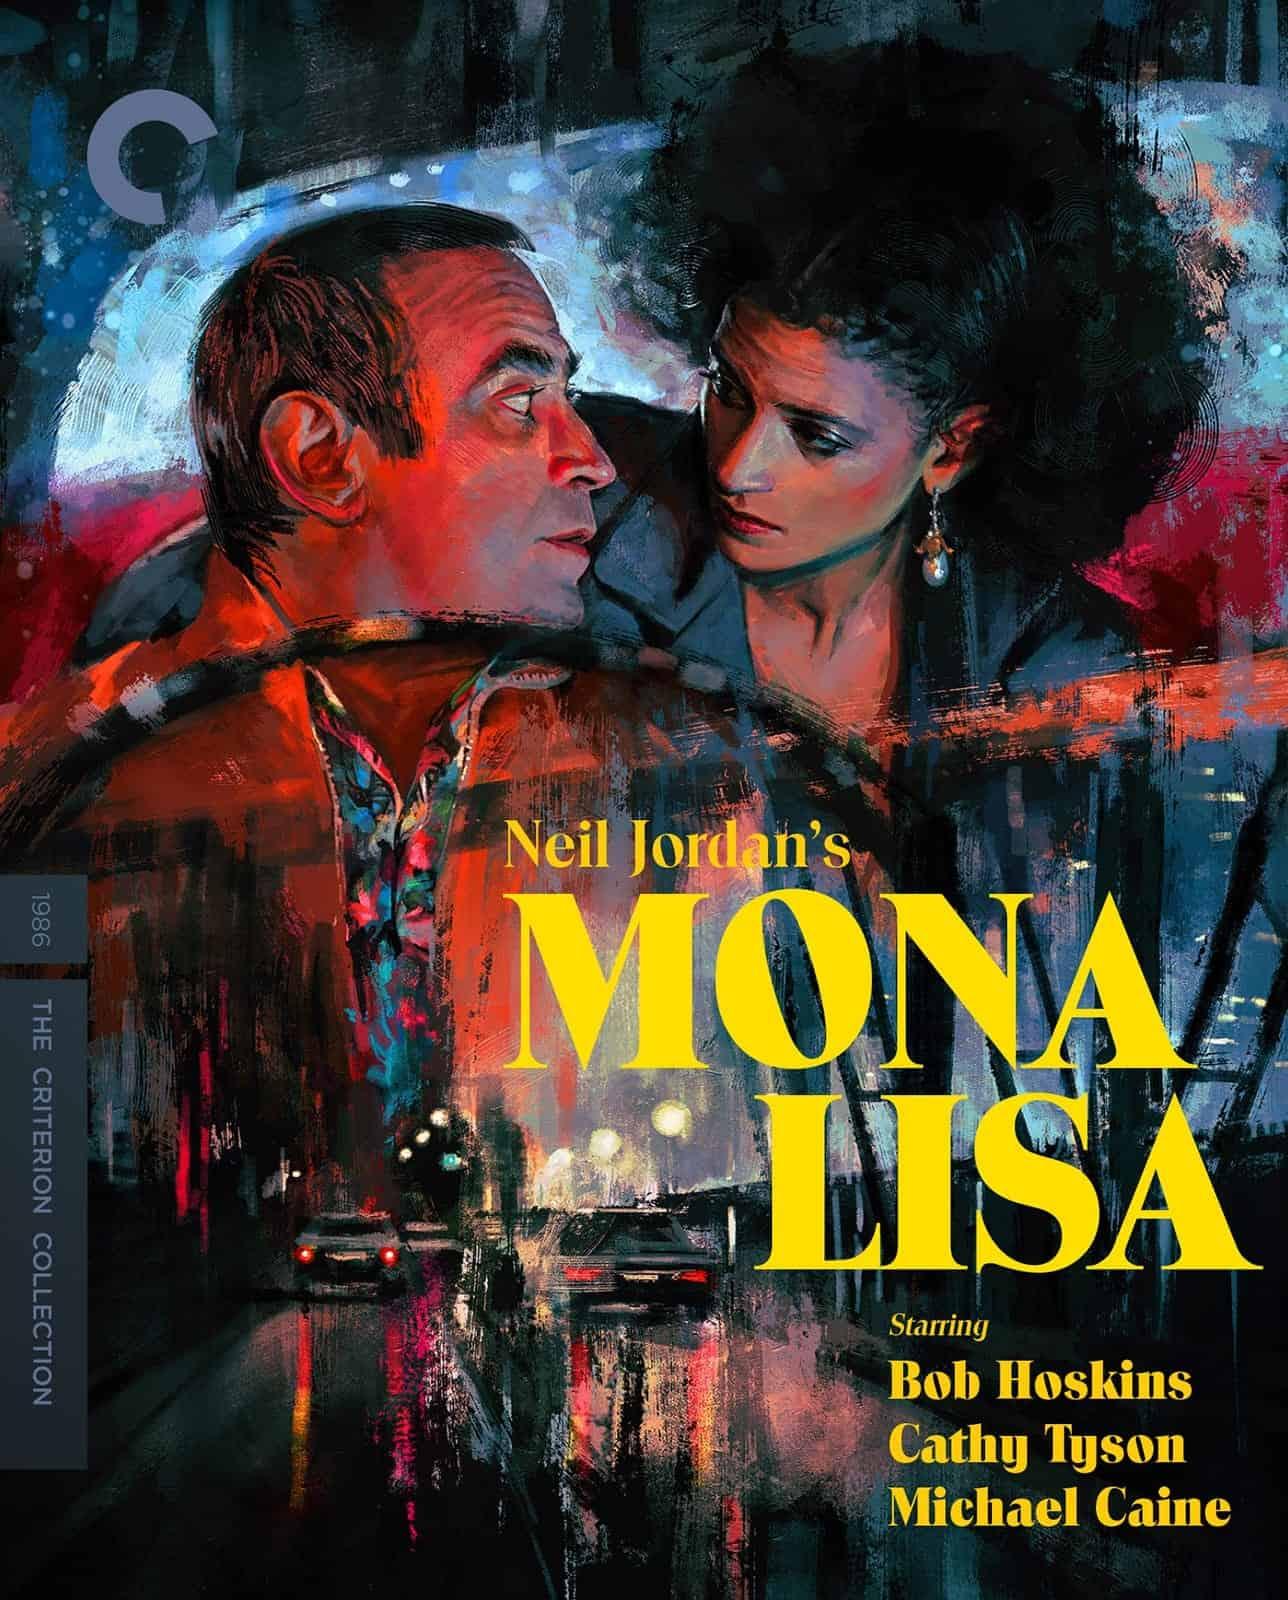 Mona Lisa Criterion Collection Bluray Cover